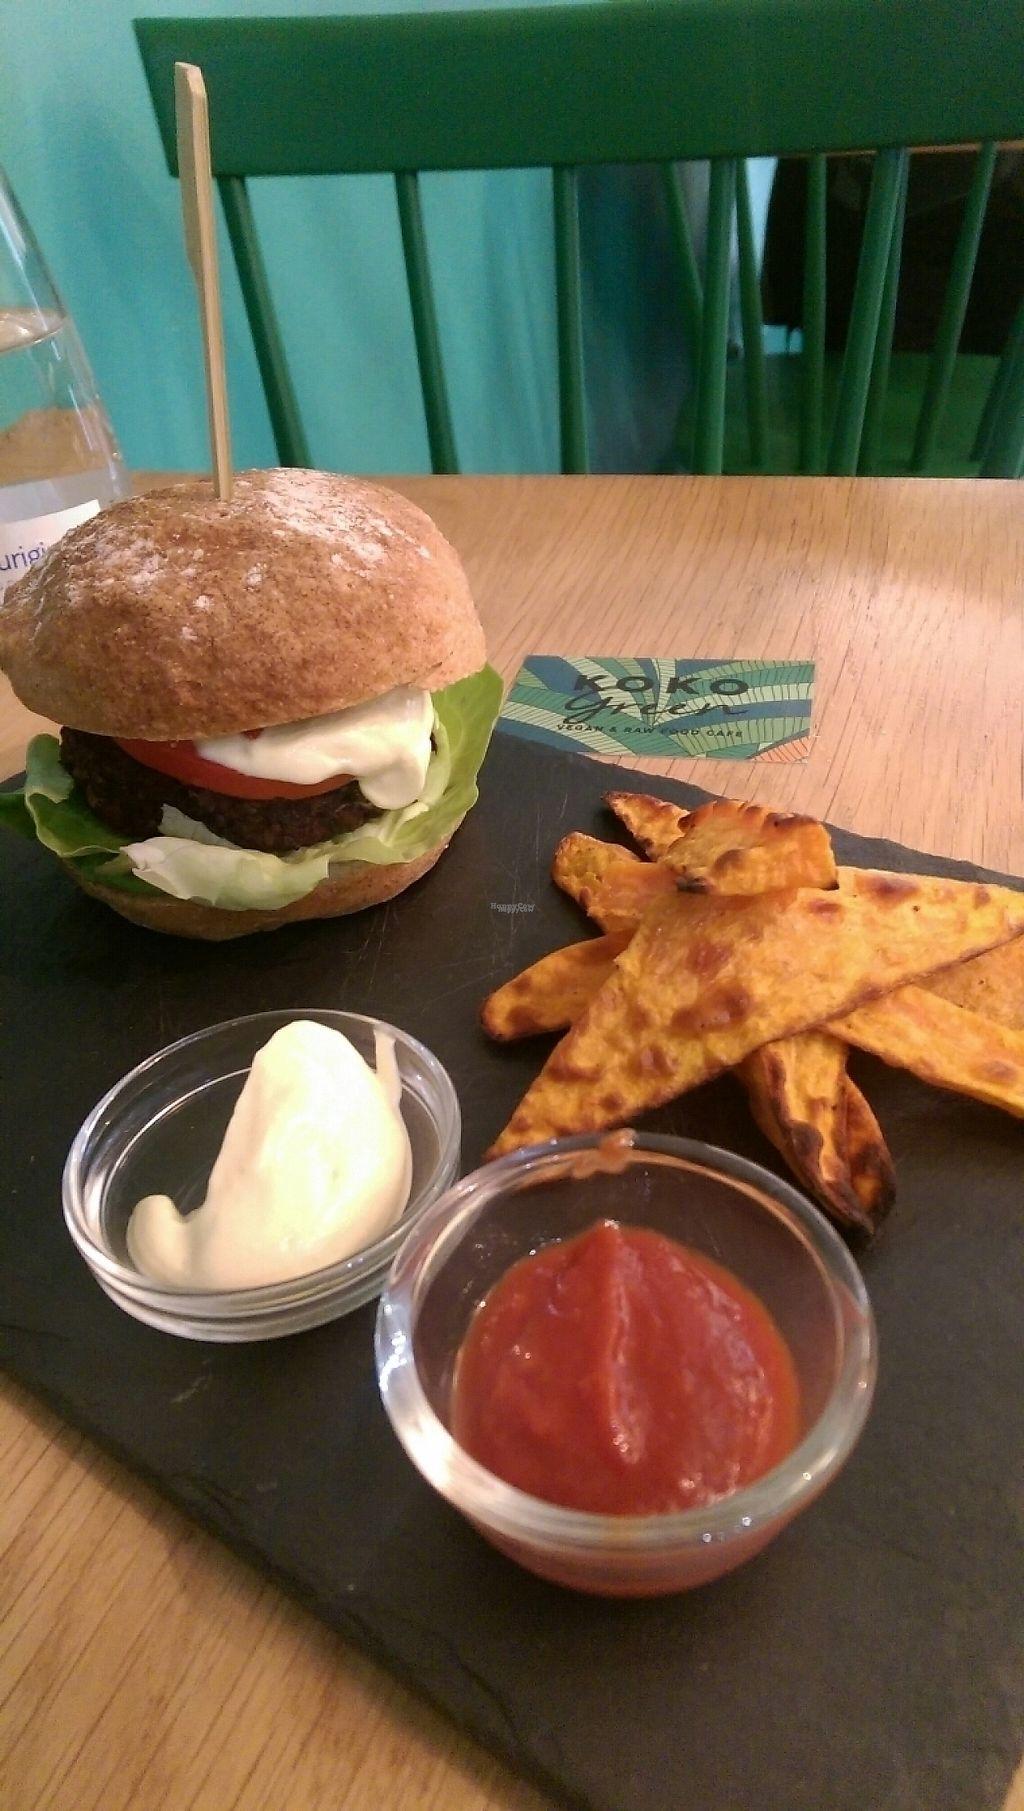 "Photo of KOKO Green  by <a href=""/members/profile/Melissaj1990"">Melissaj1990</a> <br/>vegan burger <br/> November 21, 2016  - <a href='/contact/abuse/image/75042/192893'>Report</a>"